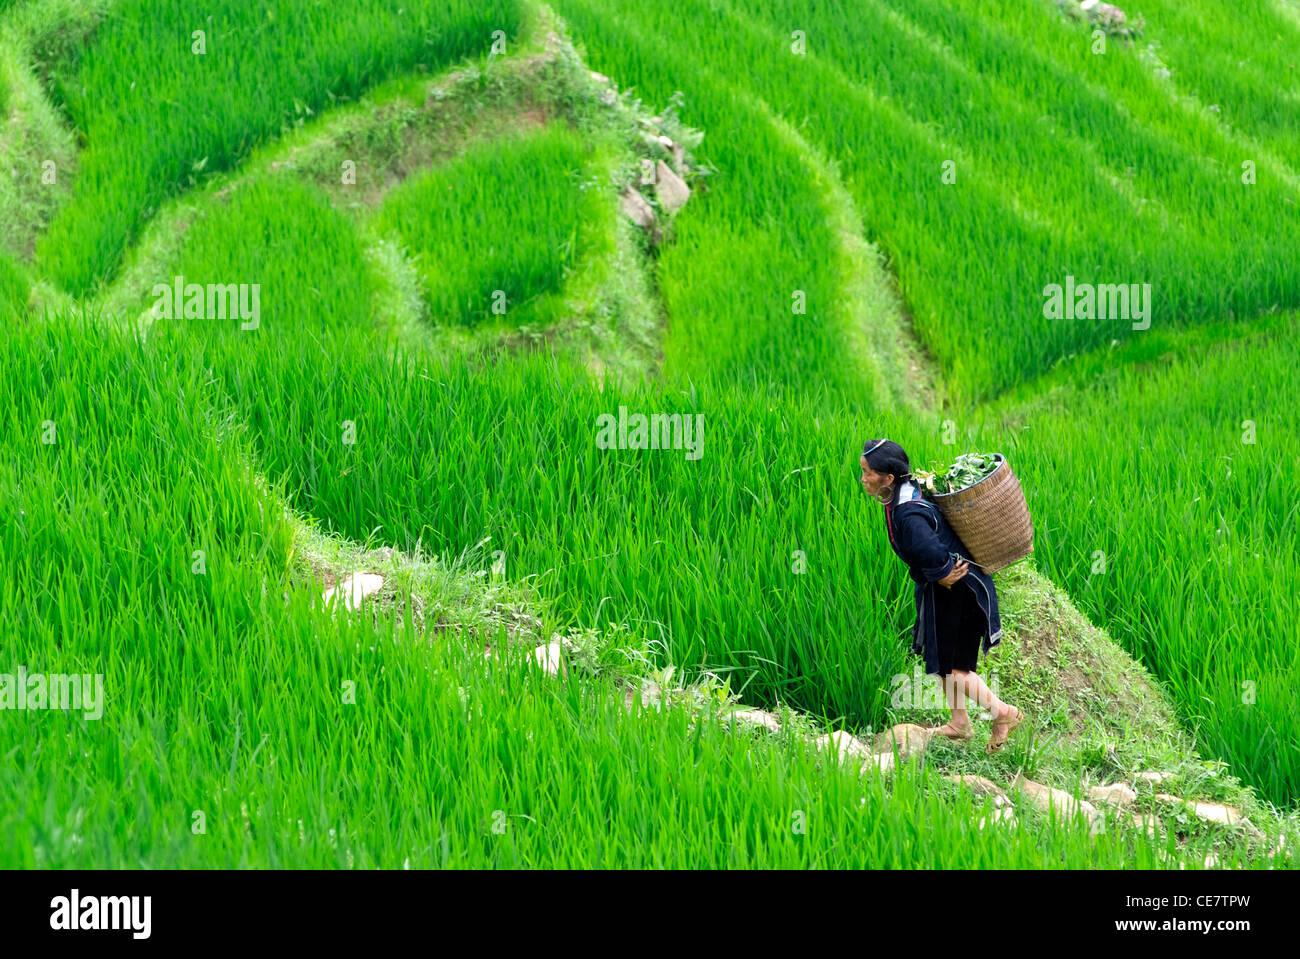 A hilltribe woman walks through paddy fields in Sapa Vietnam - Stock Image